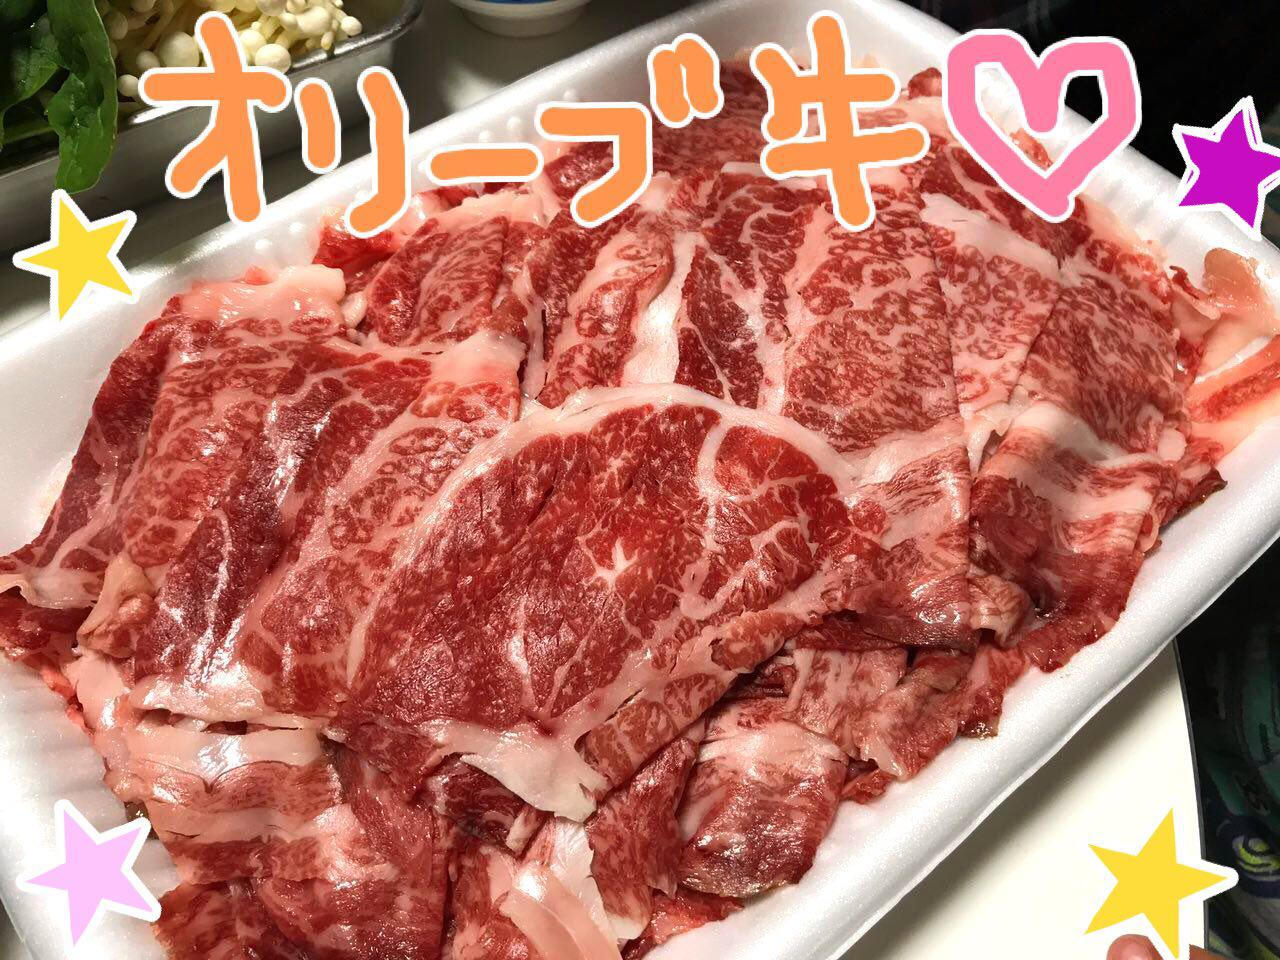 photo_2017-11-17_00-29-51.jpg